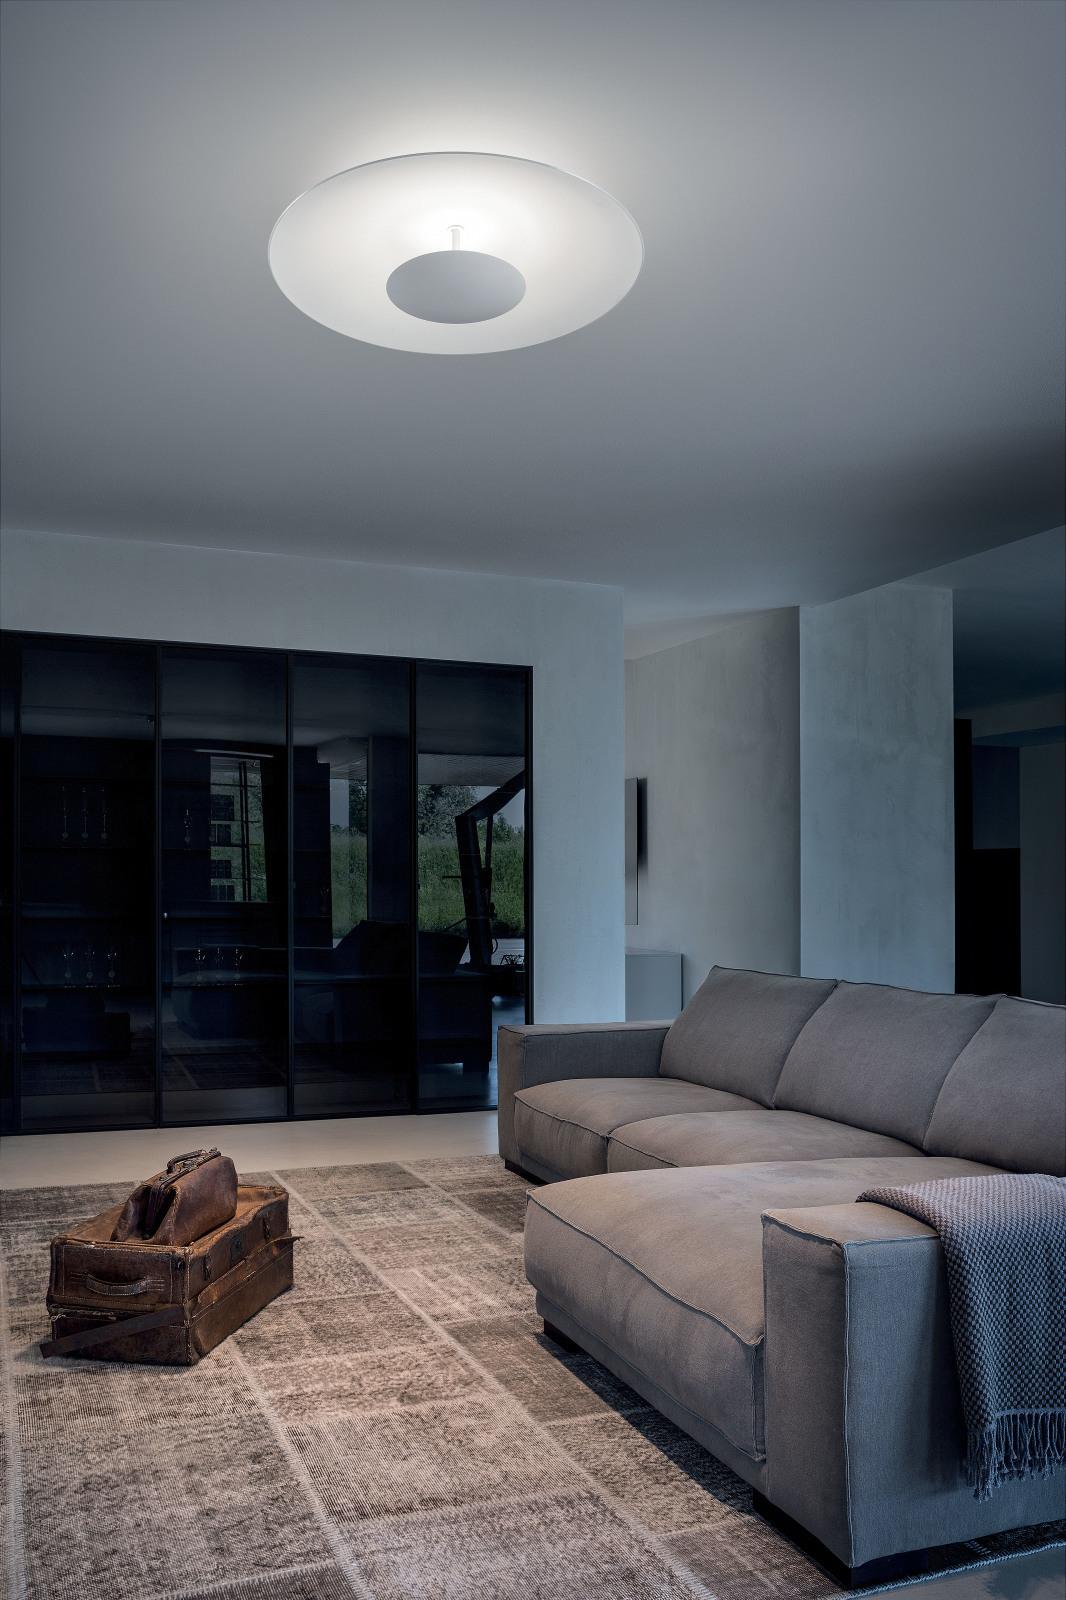 Ceiling Lights: Horizon_S   Linea Light Group